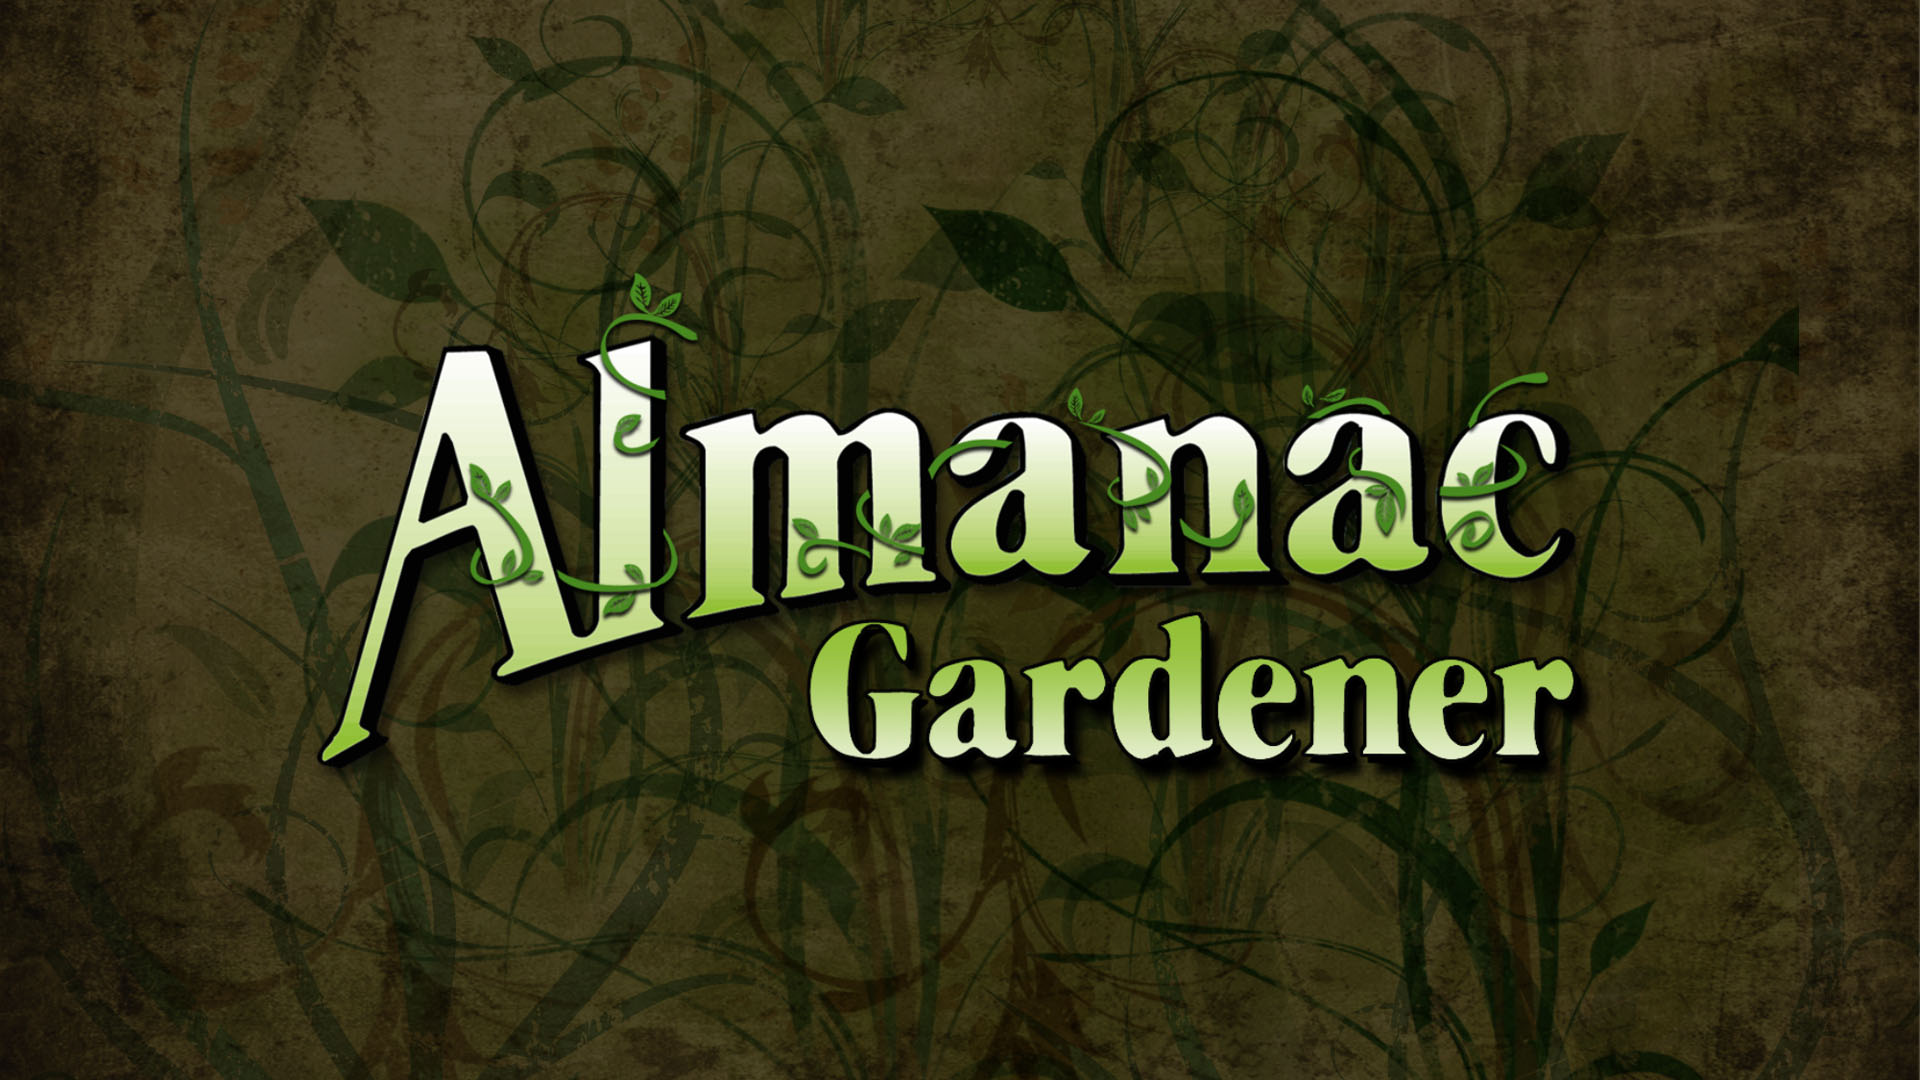 Learn More about Almanac Gardener